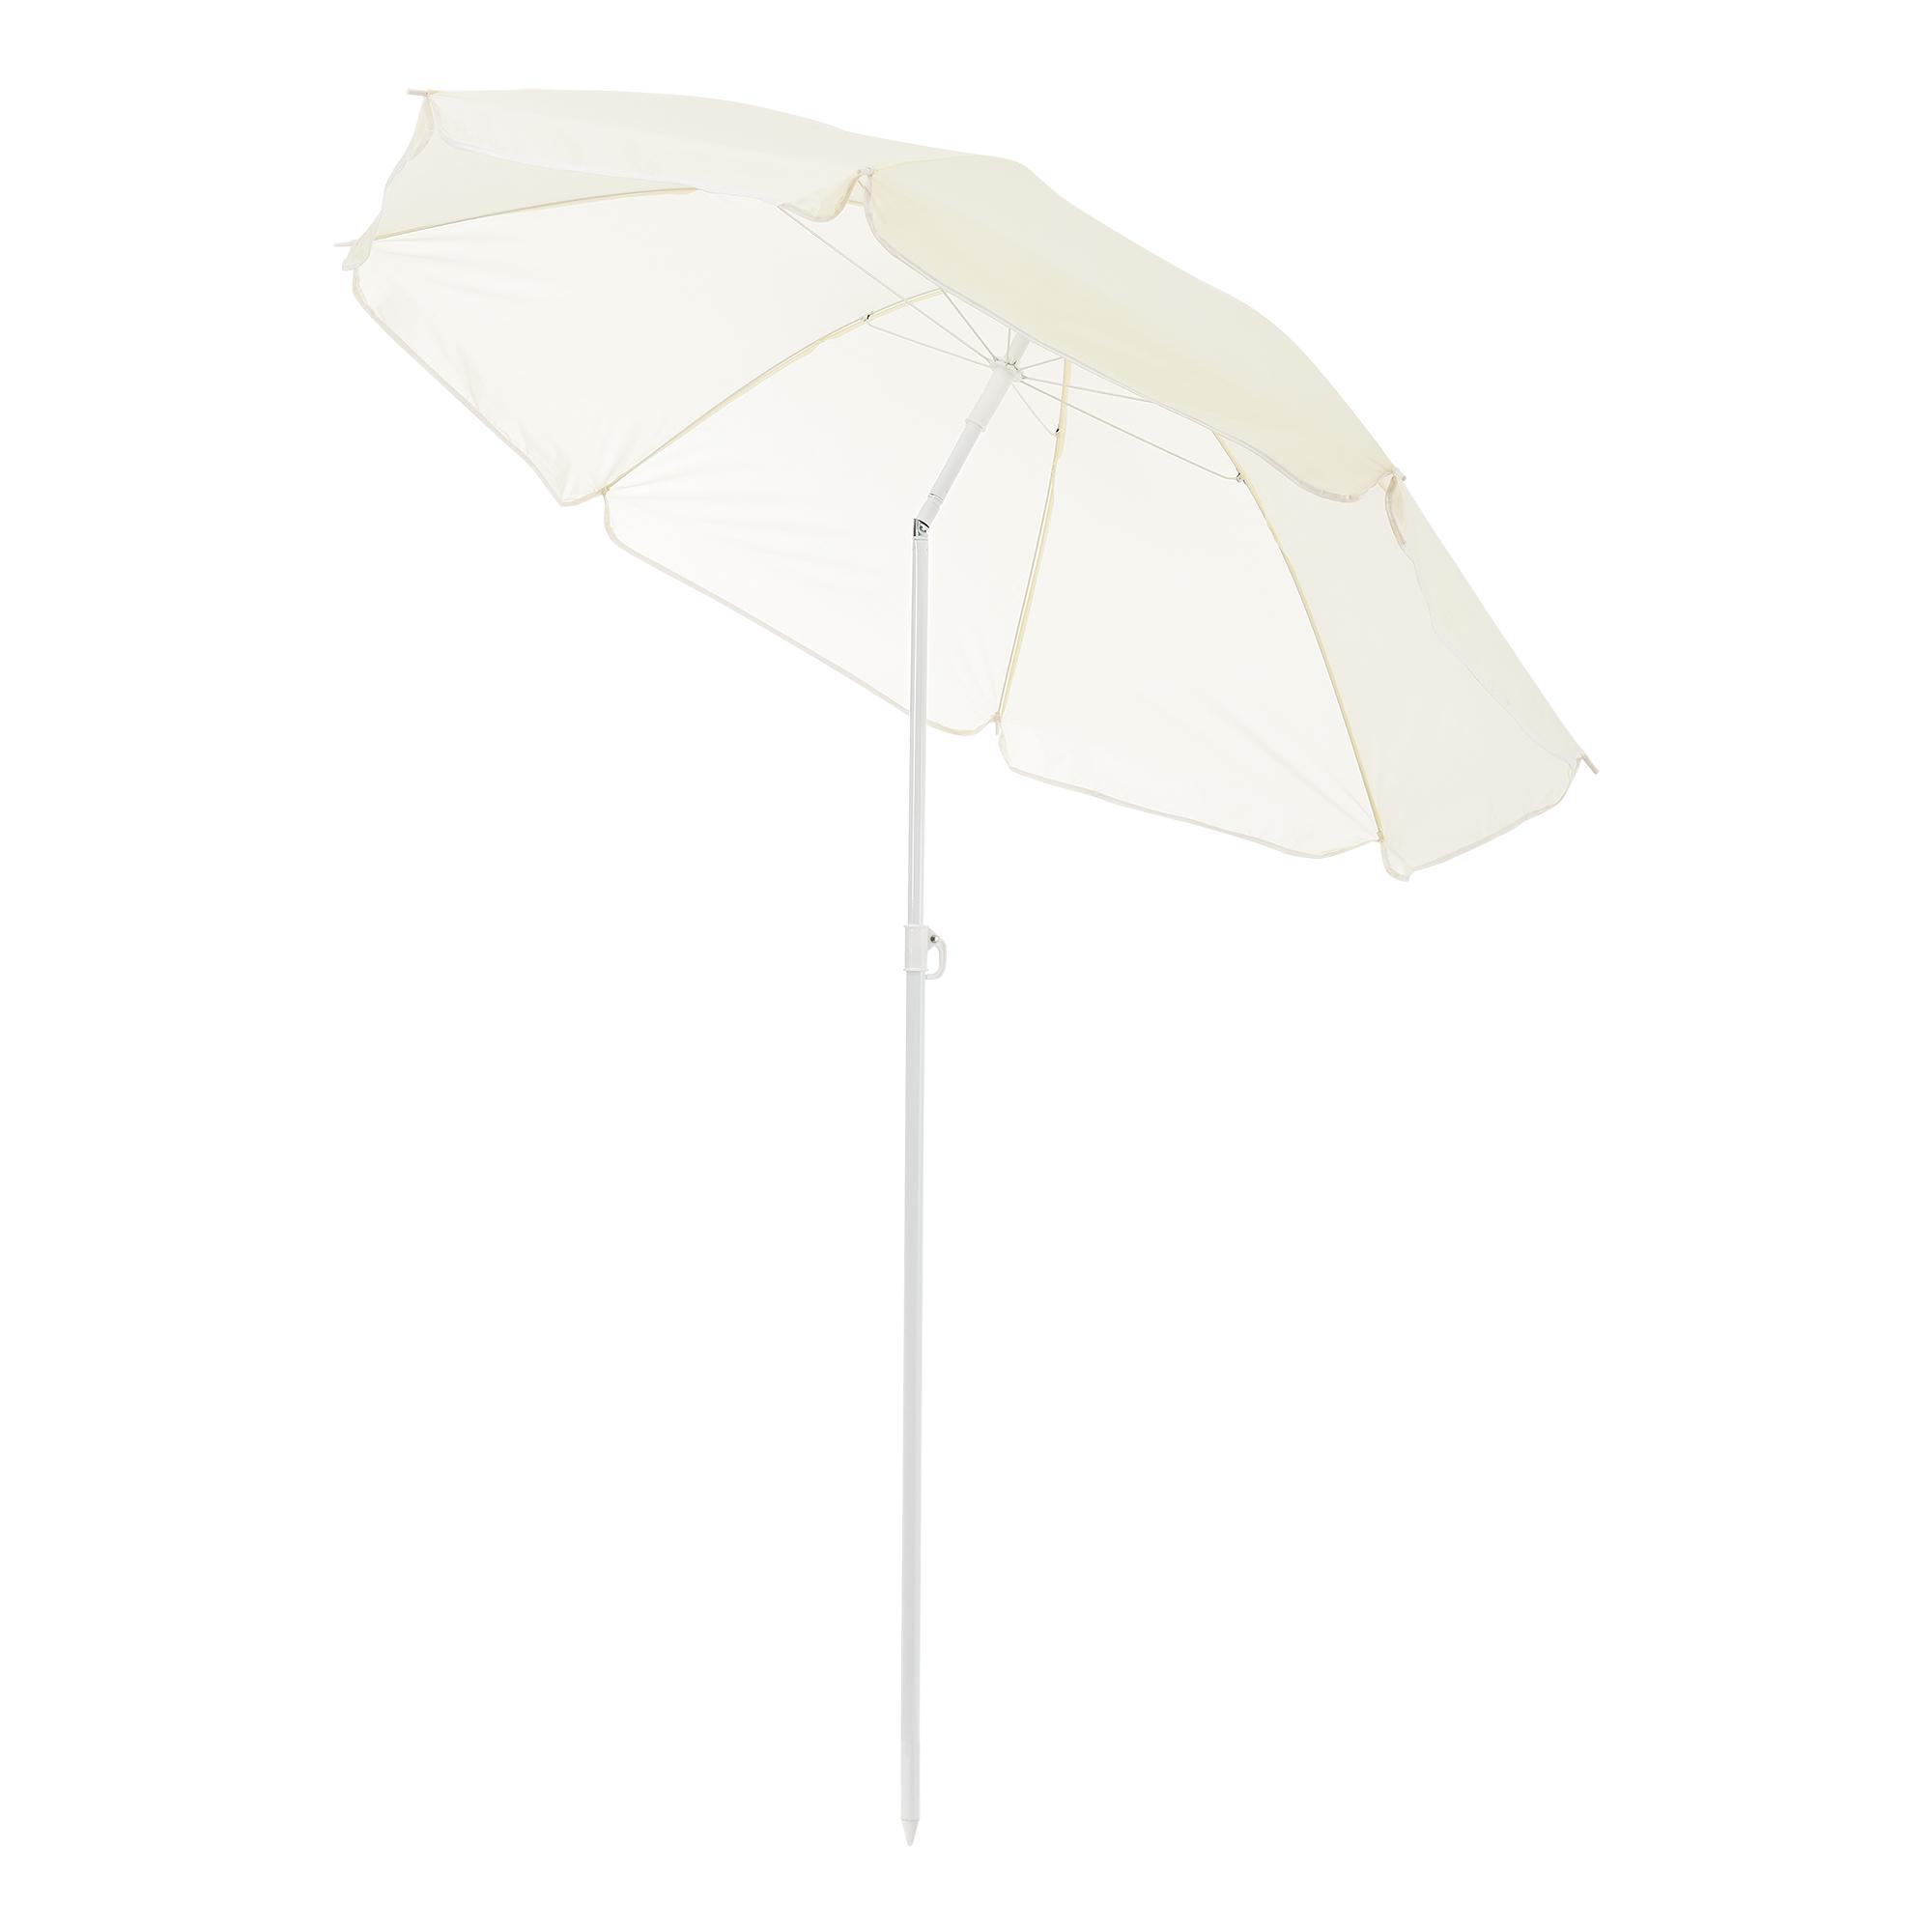 Strandschirm 180cm Creme Sonnenschirm Schirm Gartenschirm Knickgelenk casa.pro